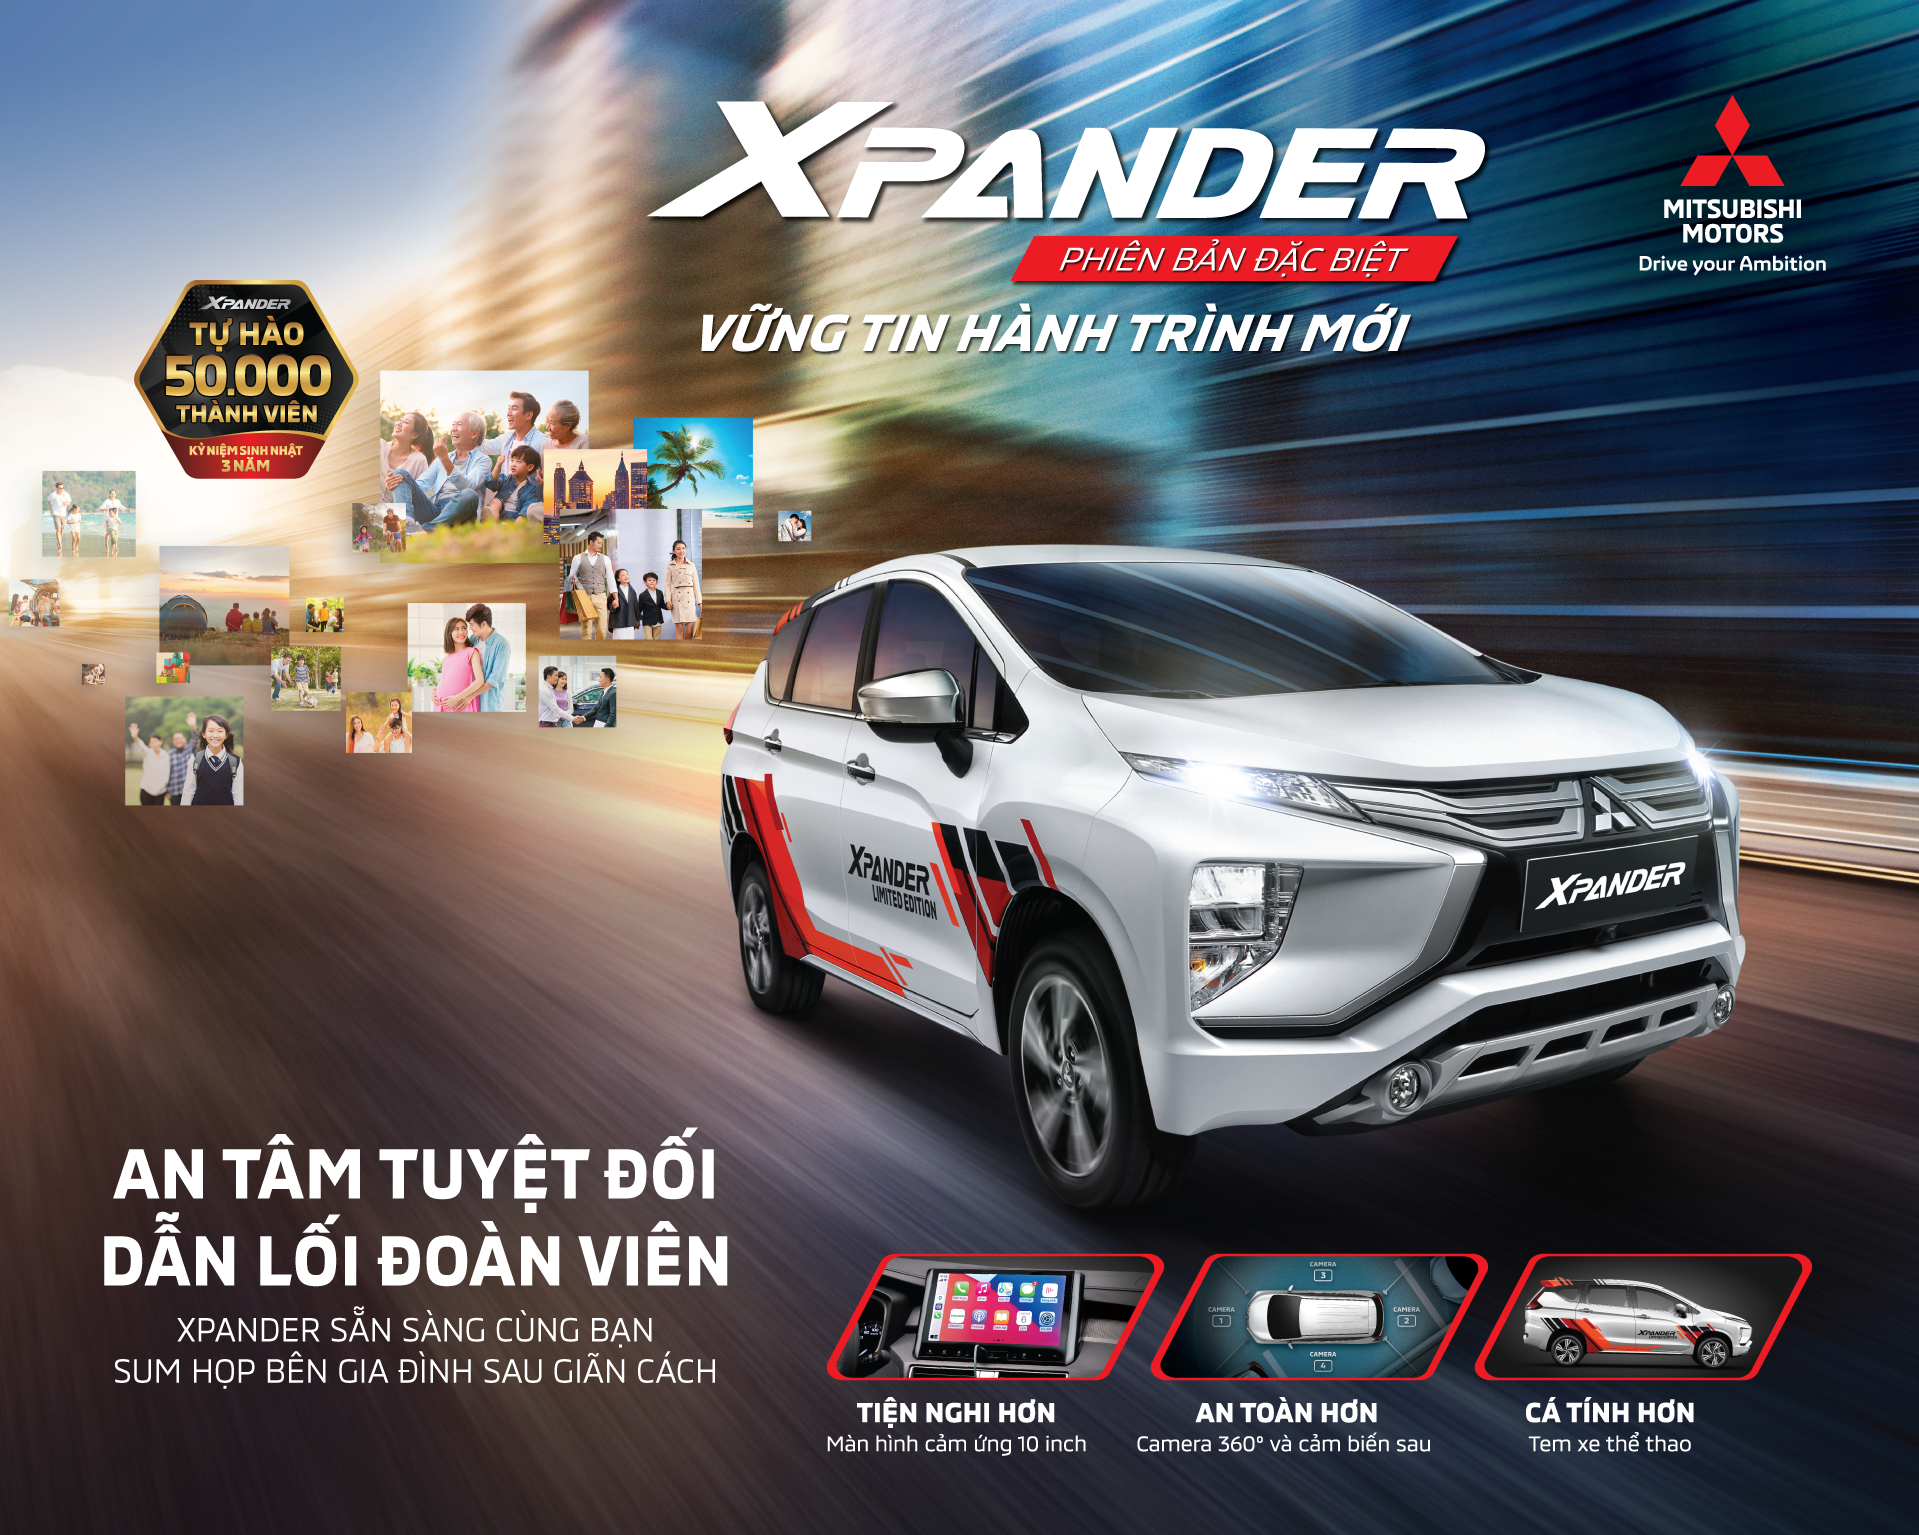 Mitsubishi Motors Vietnam introduces Xpander Special Edition